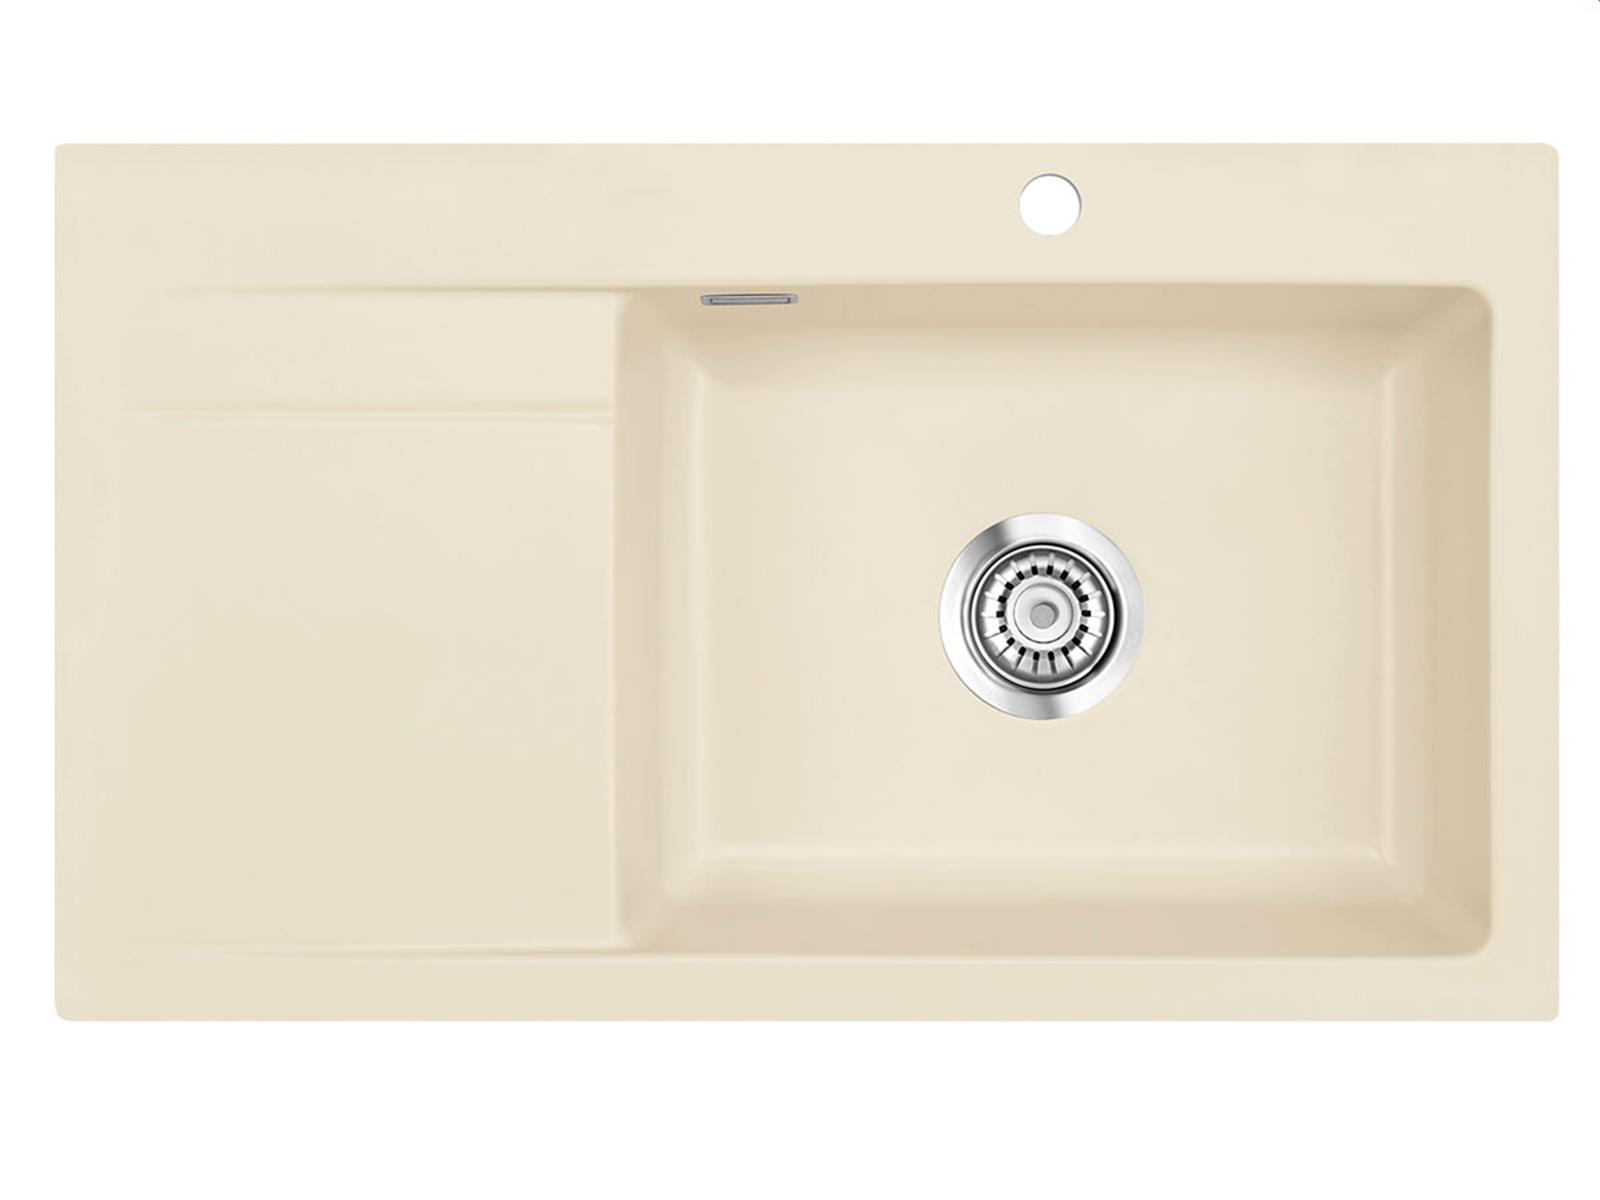 Systemceram Stema 86 SL Noblesse Keramikspüle Handbetätigung